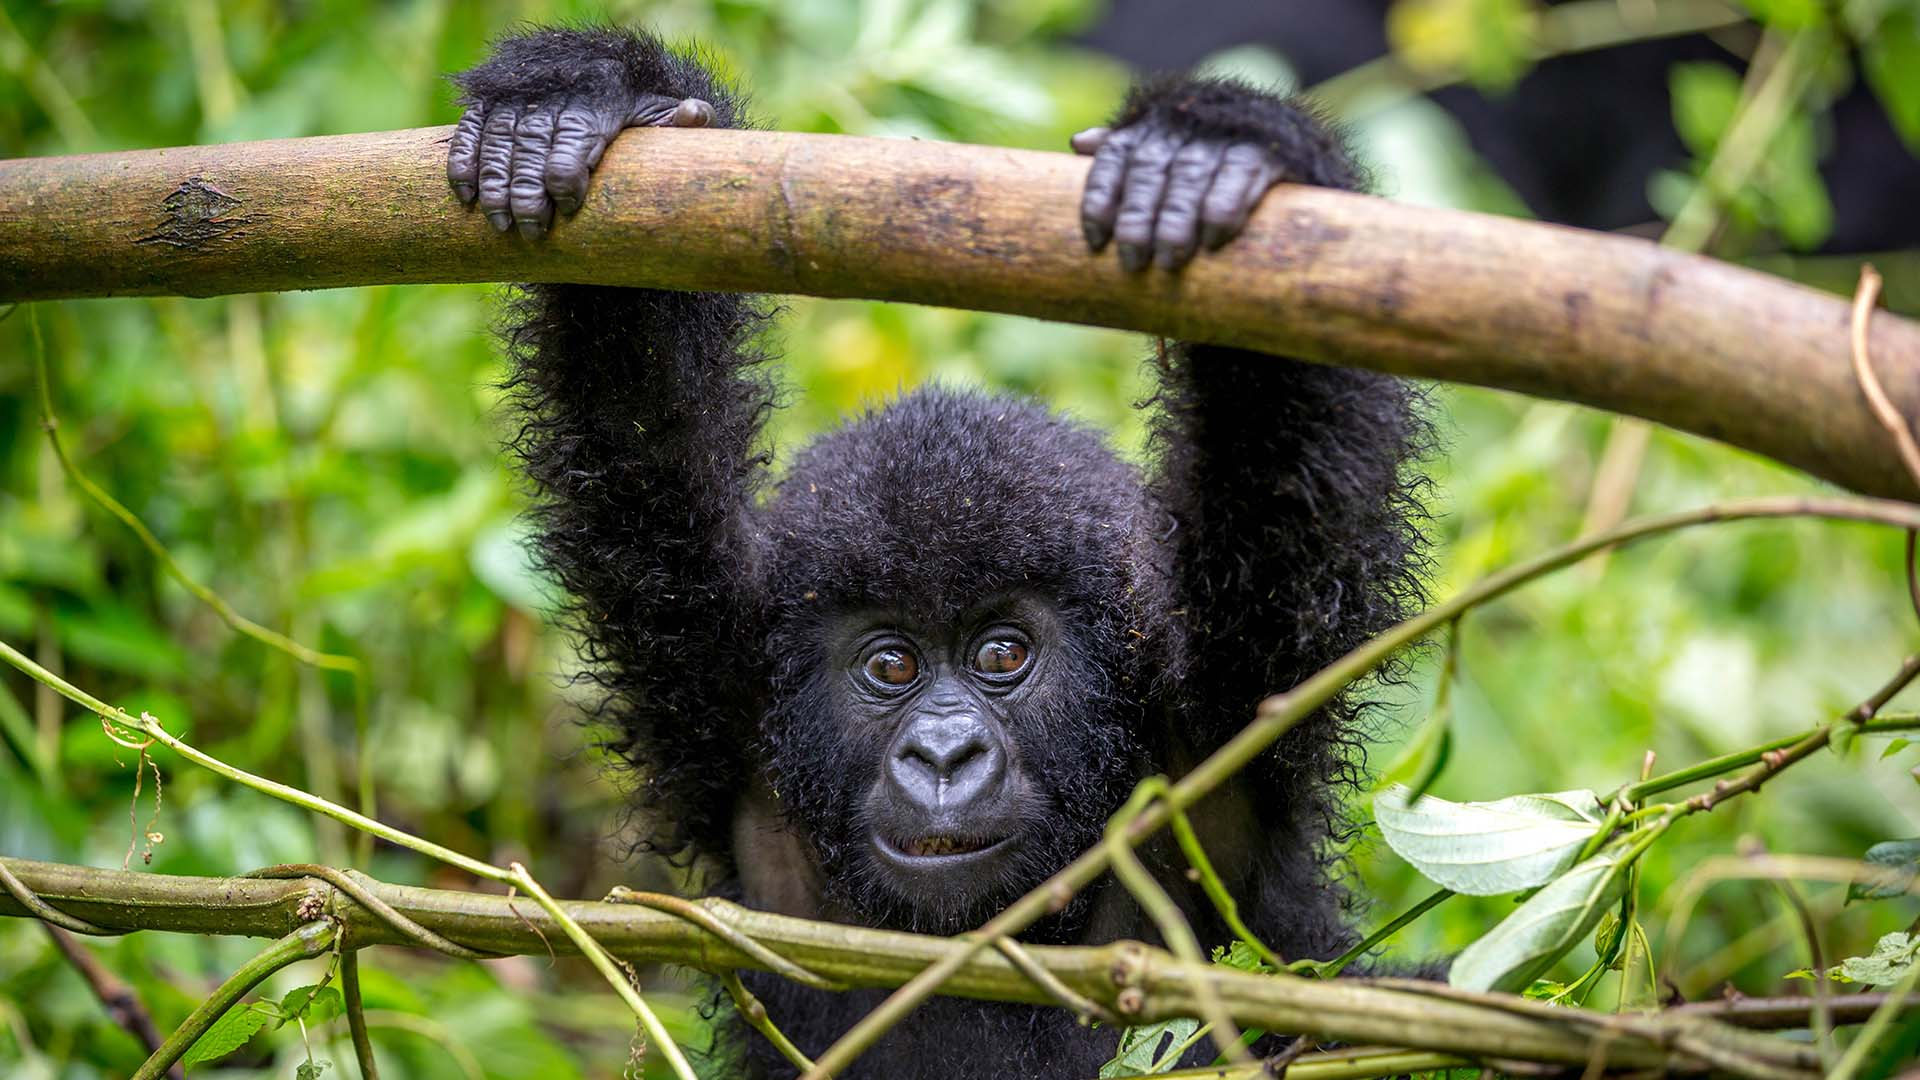 Gorilla trekking in Bwindi & packing list